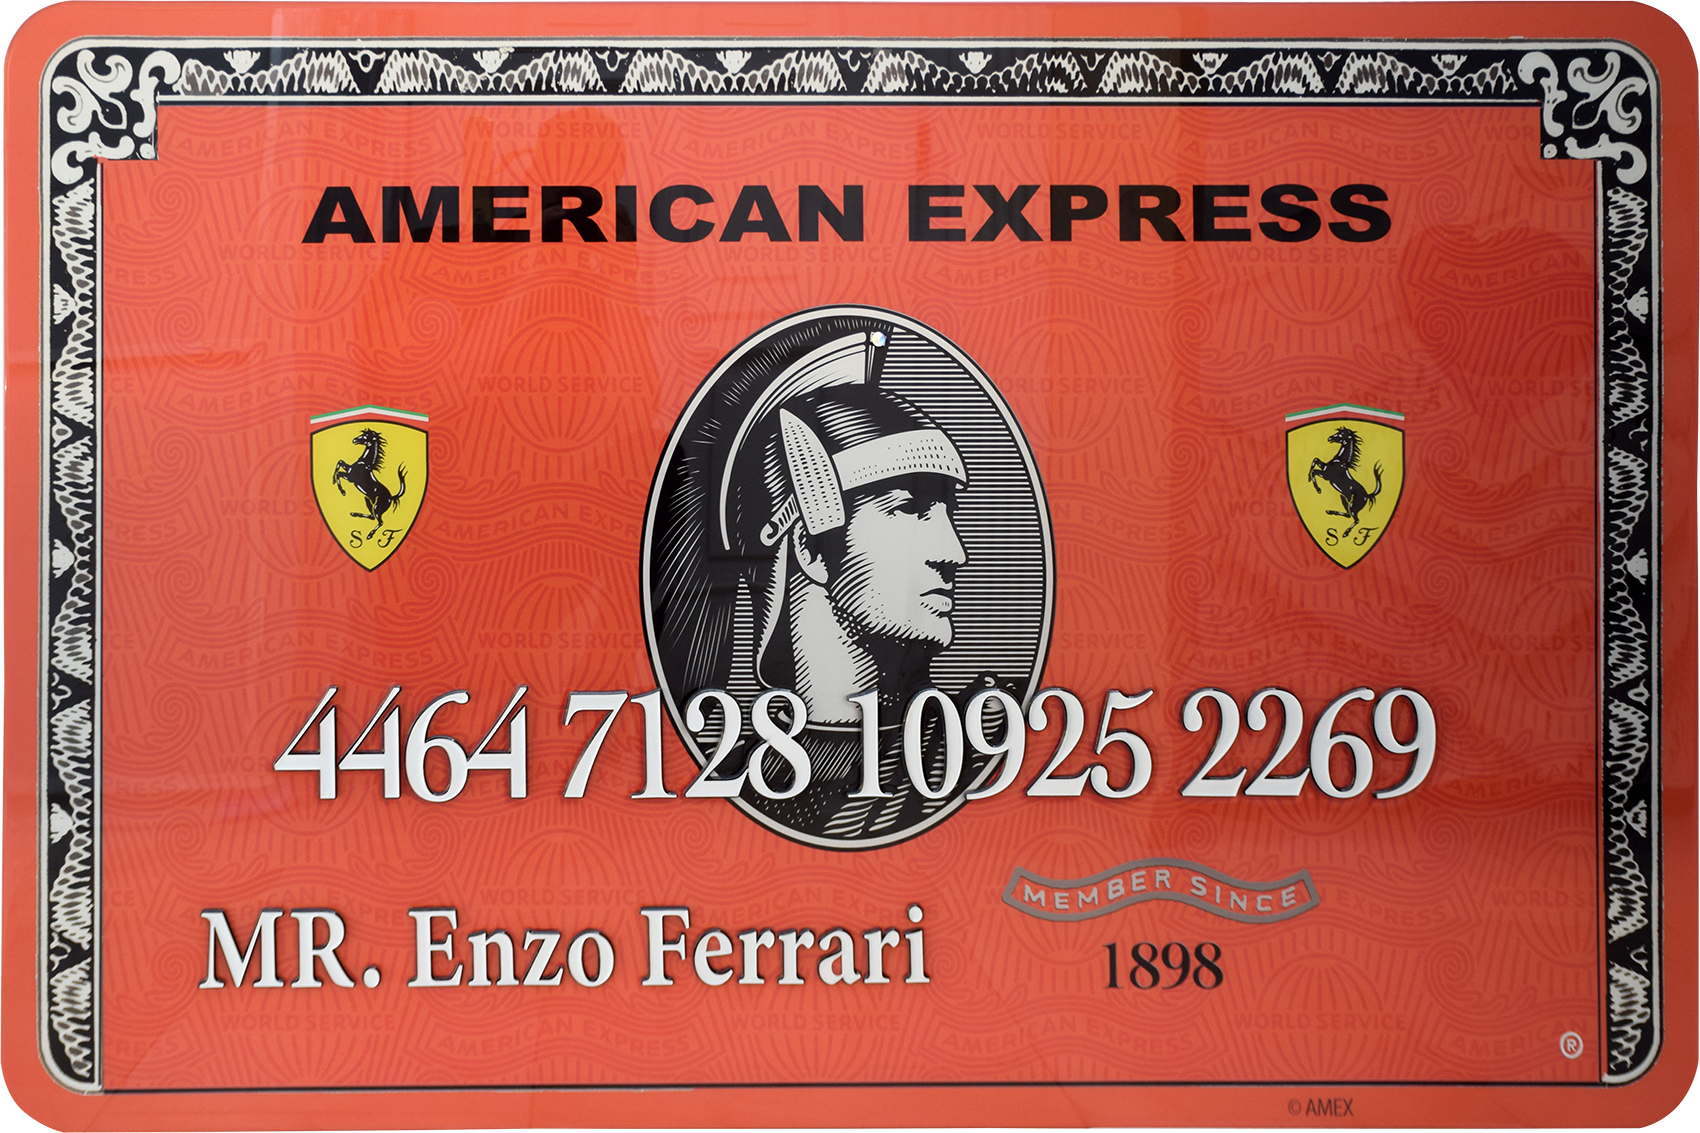 Diederik - AMEX (Mr. Enzo Ferrari) , 4504-016-266